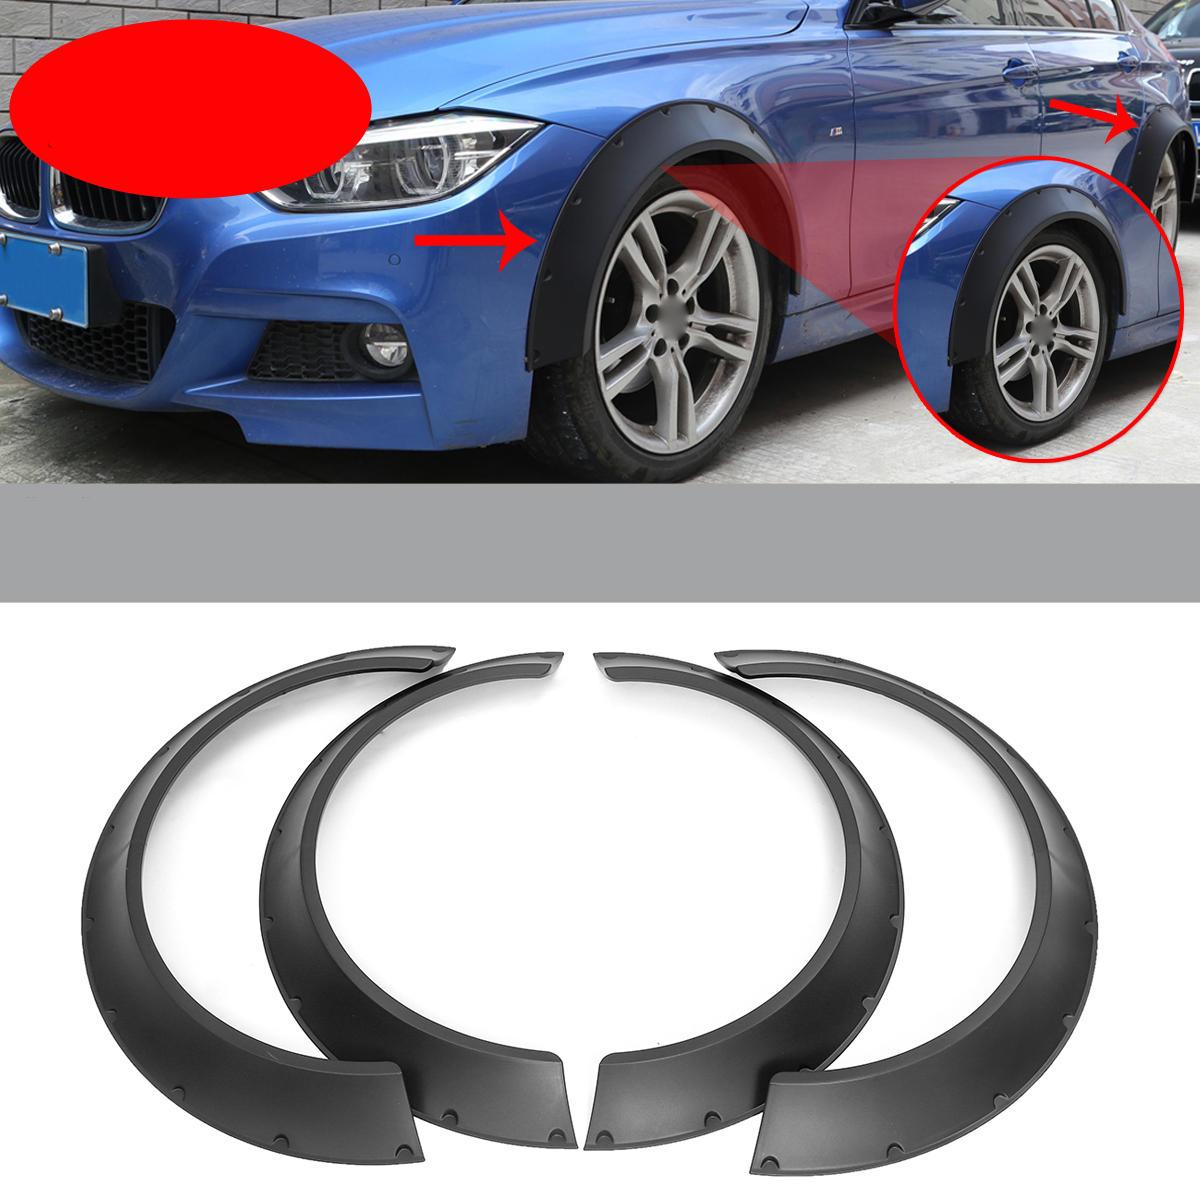 Car Body Kits >> Universal Car Fender Flares 4 Piece Flexible Durable Polyurethane Body Kits Extra Wide Body Wheel Arches